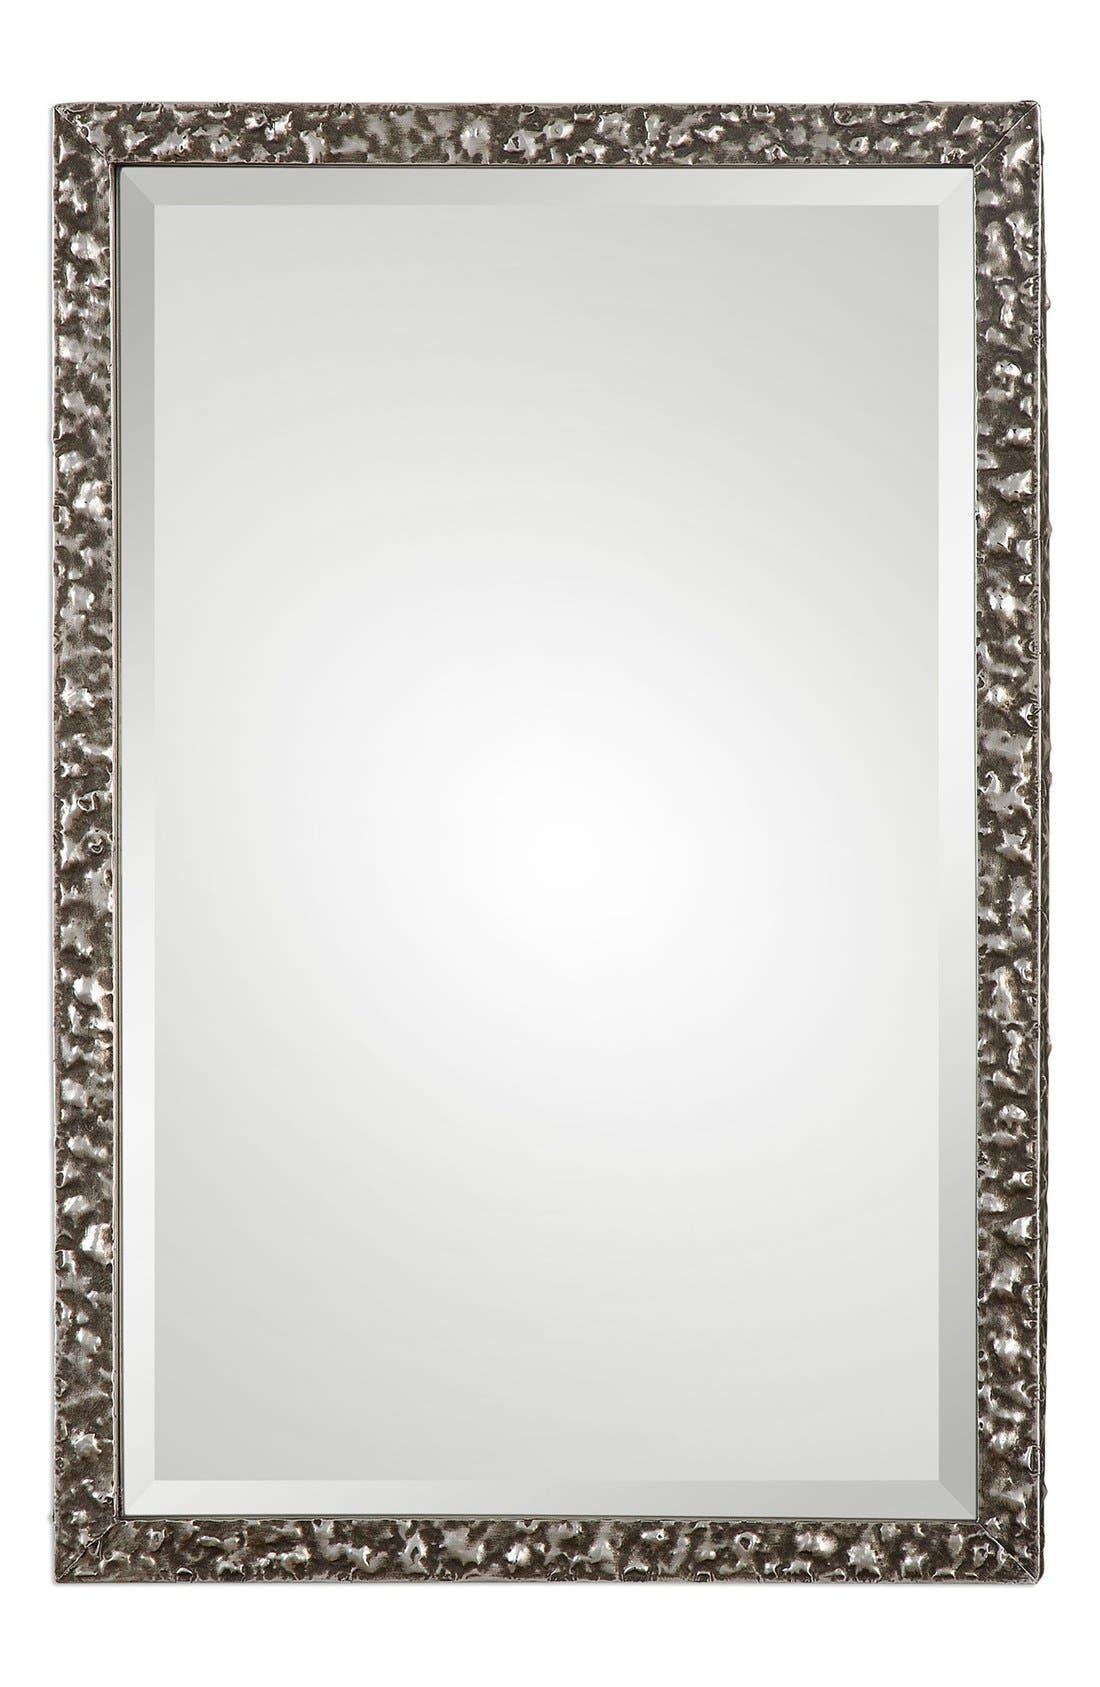 Alternate Image 1 Selected - Uttermost 'Alshon' Rectangular Wall Mirror